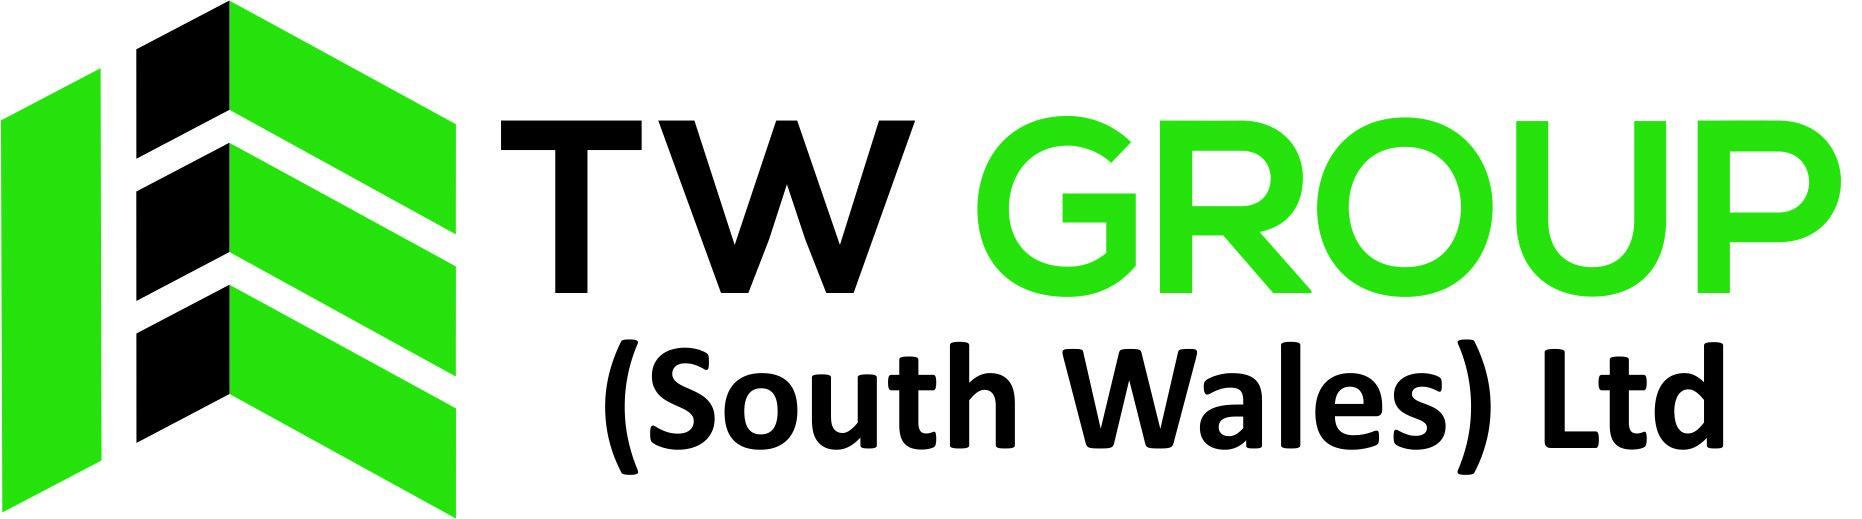 TWConstructionGroup